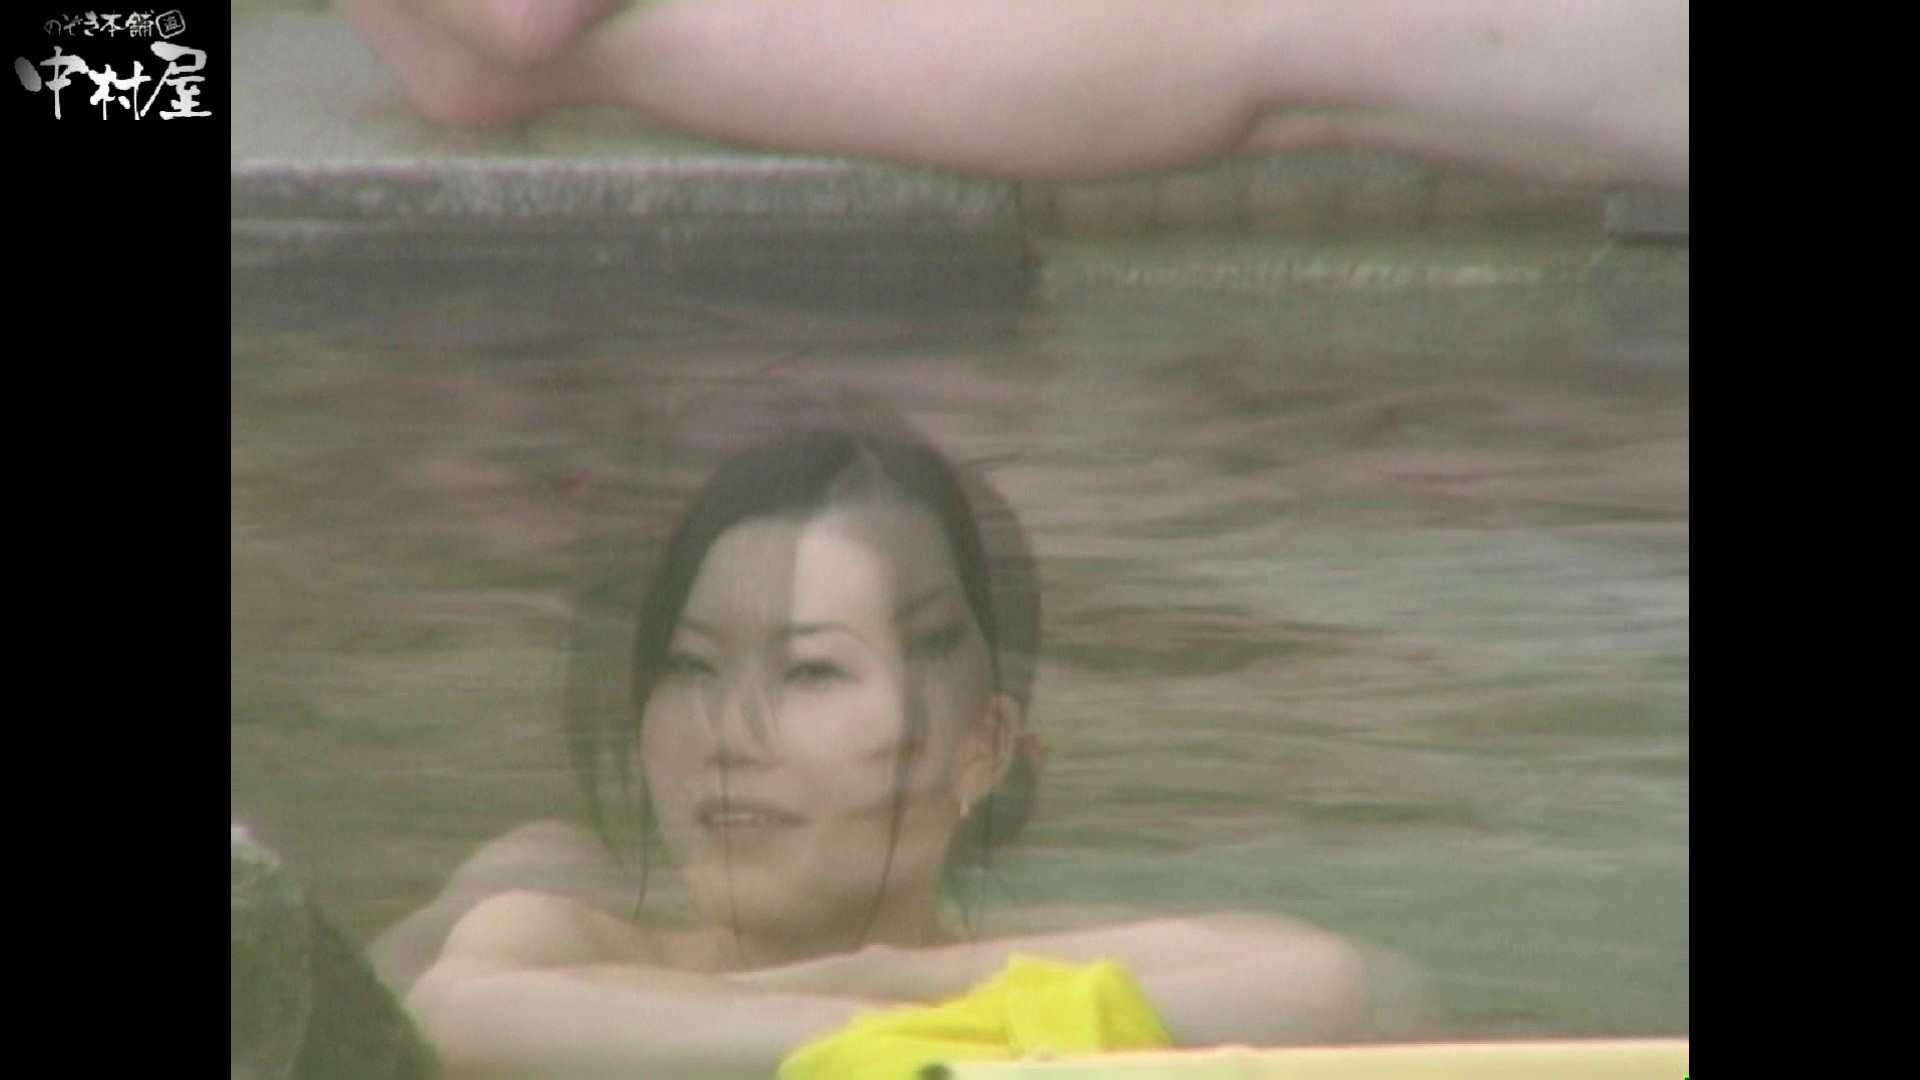 Aquaな露天風呂Vol.940 OLセックス  98画像 27